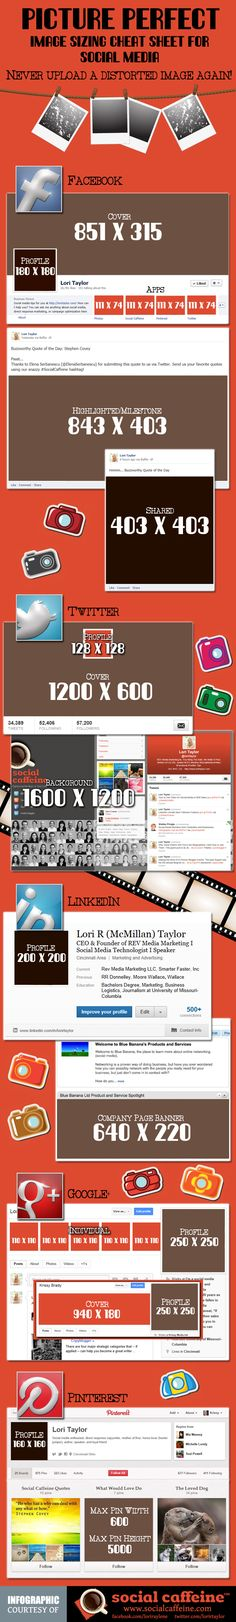 Image Dimension Cheat Sheet for #SocialMedia